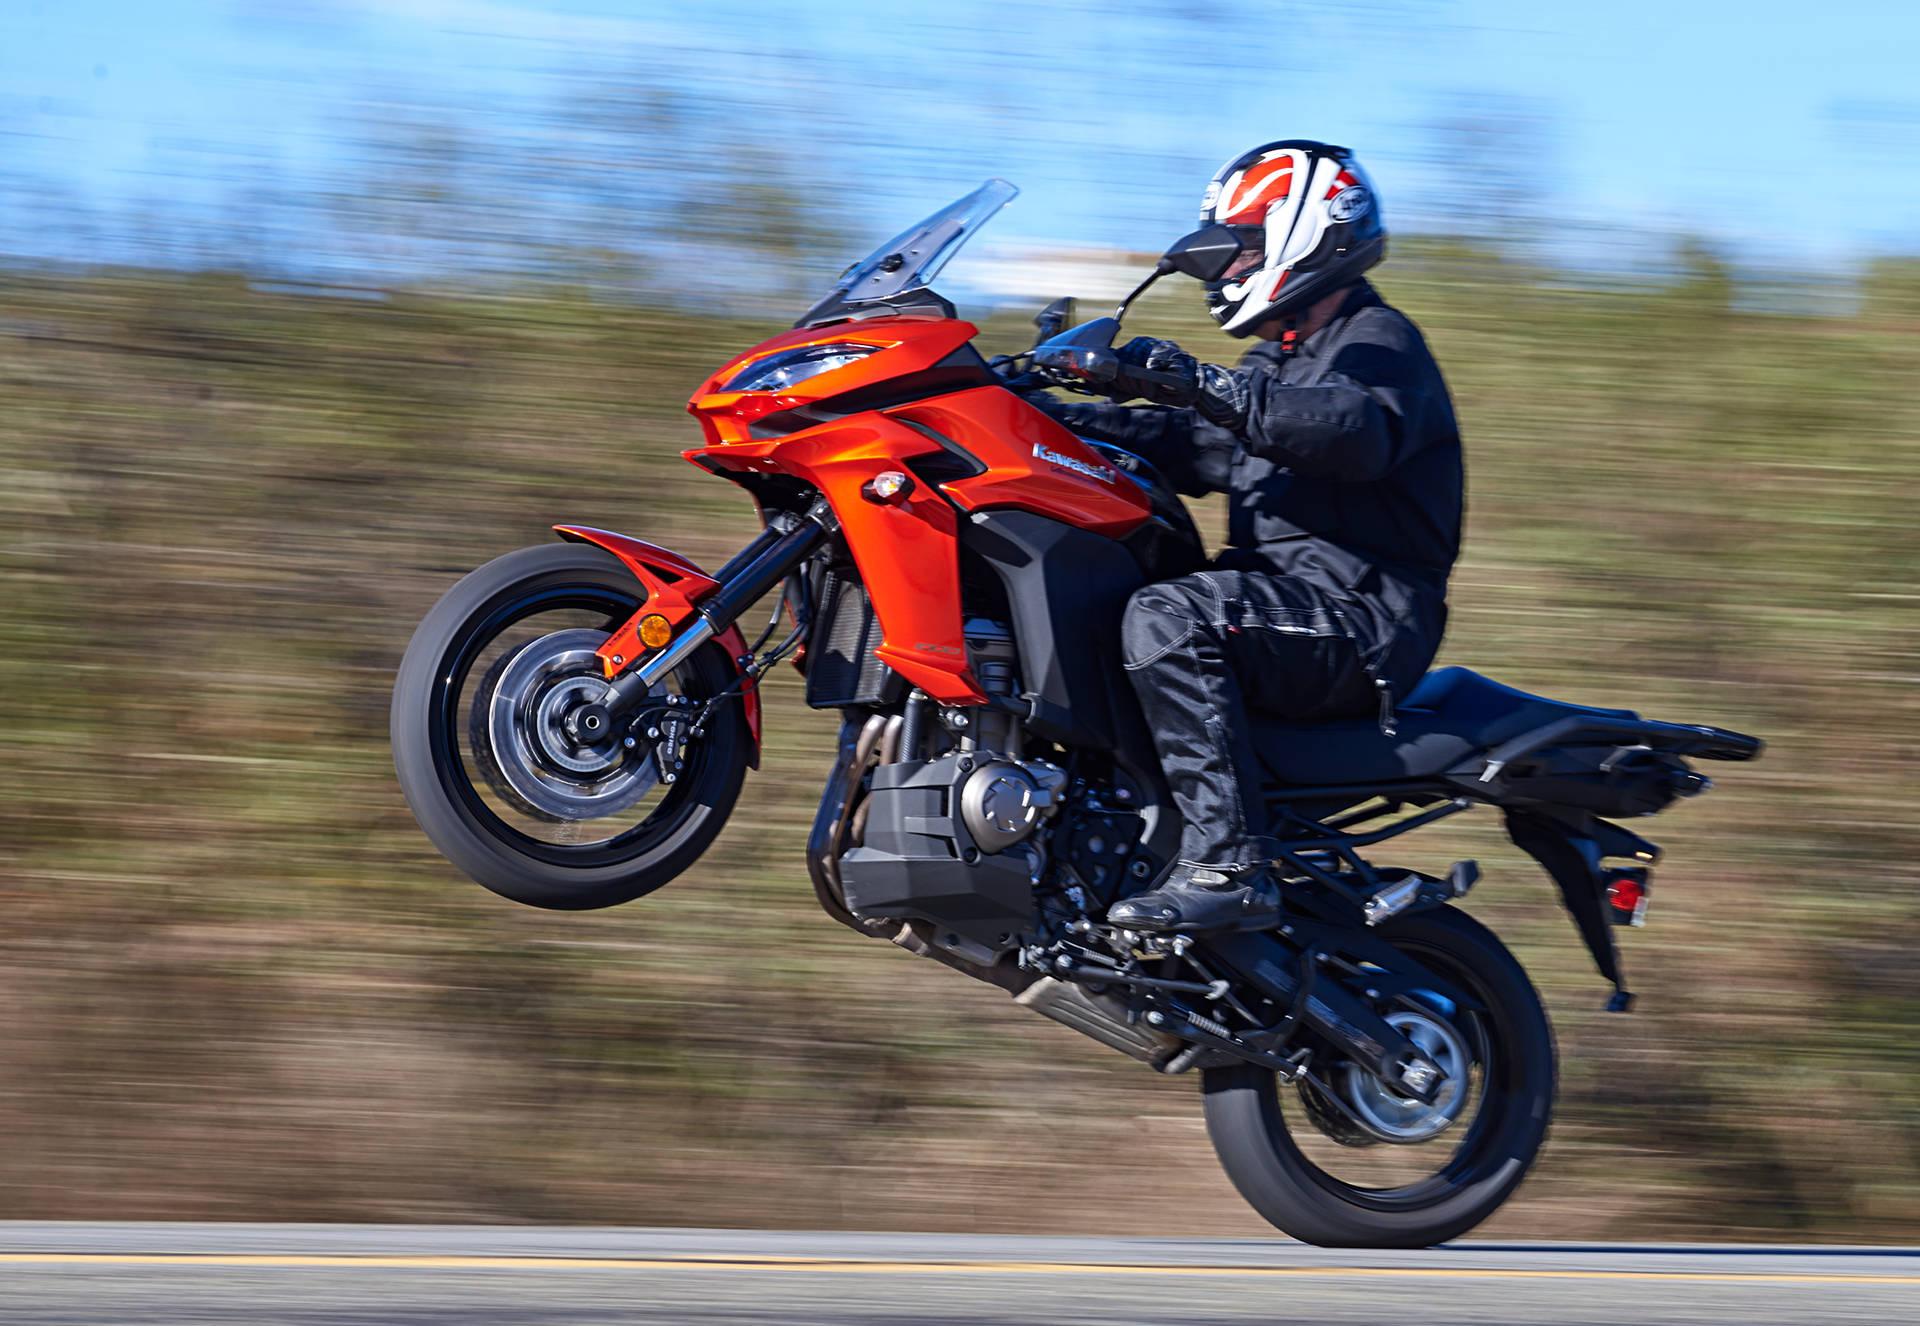 md 2015 bike of the year: the kawasaki versys 1000 lt